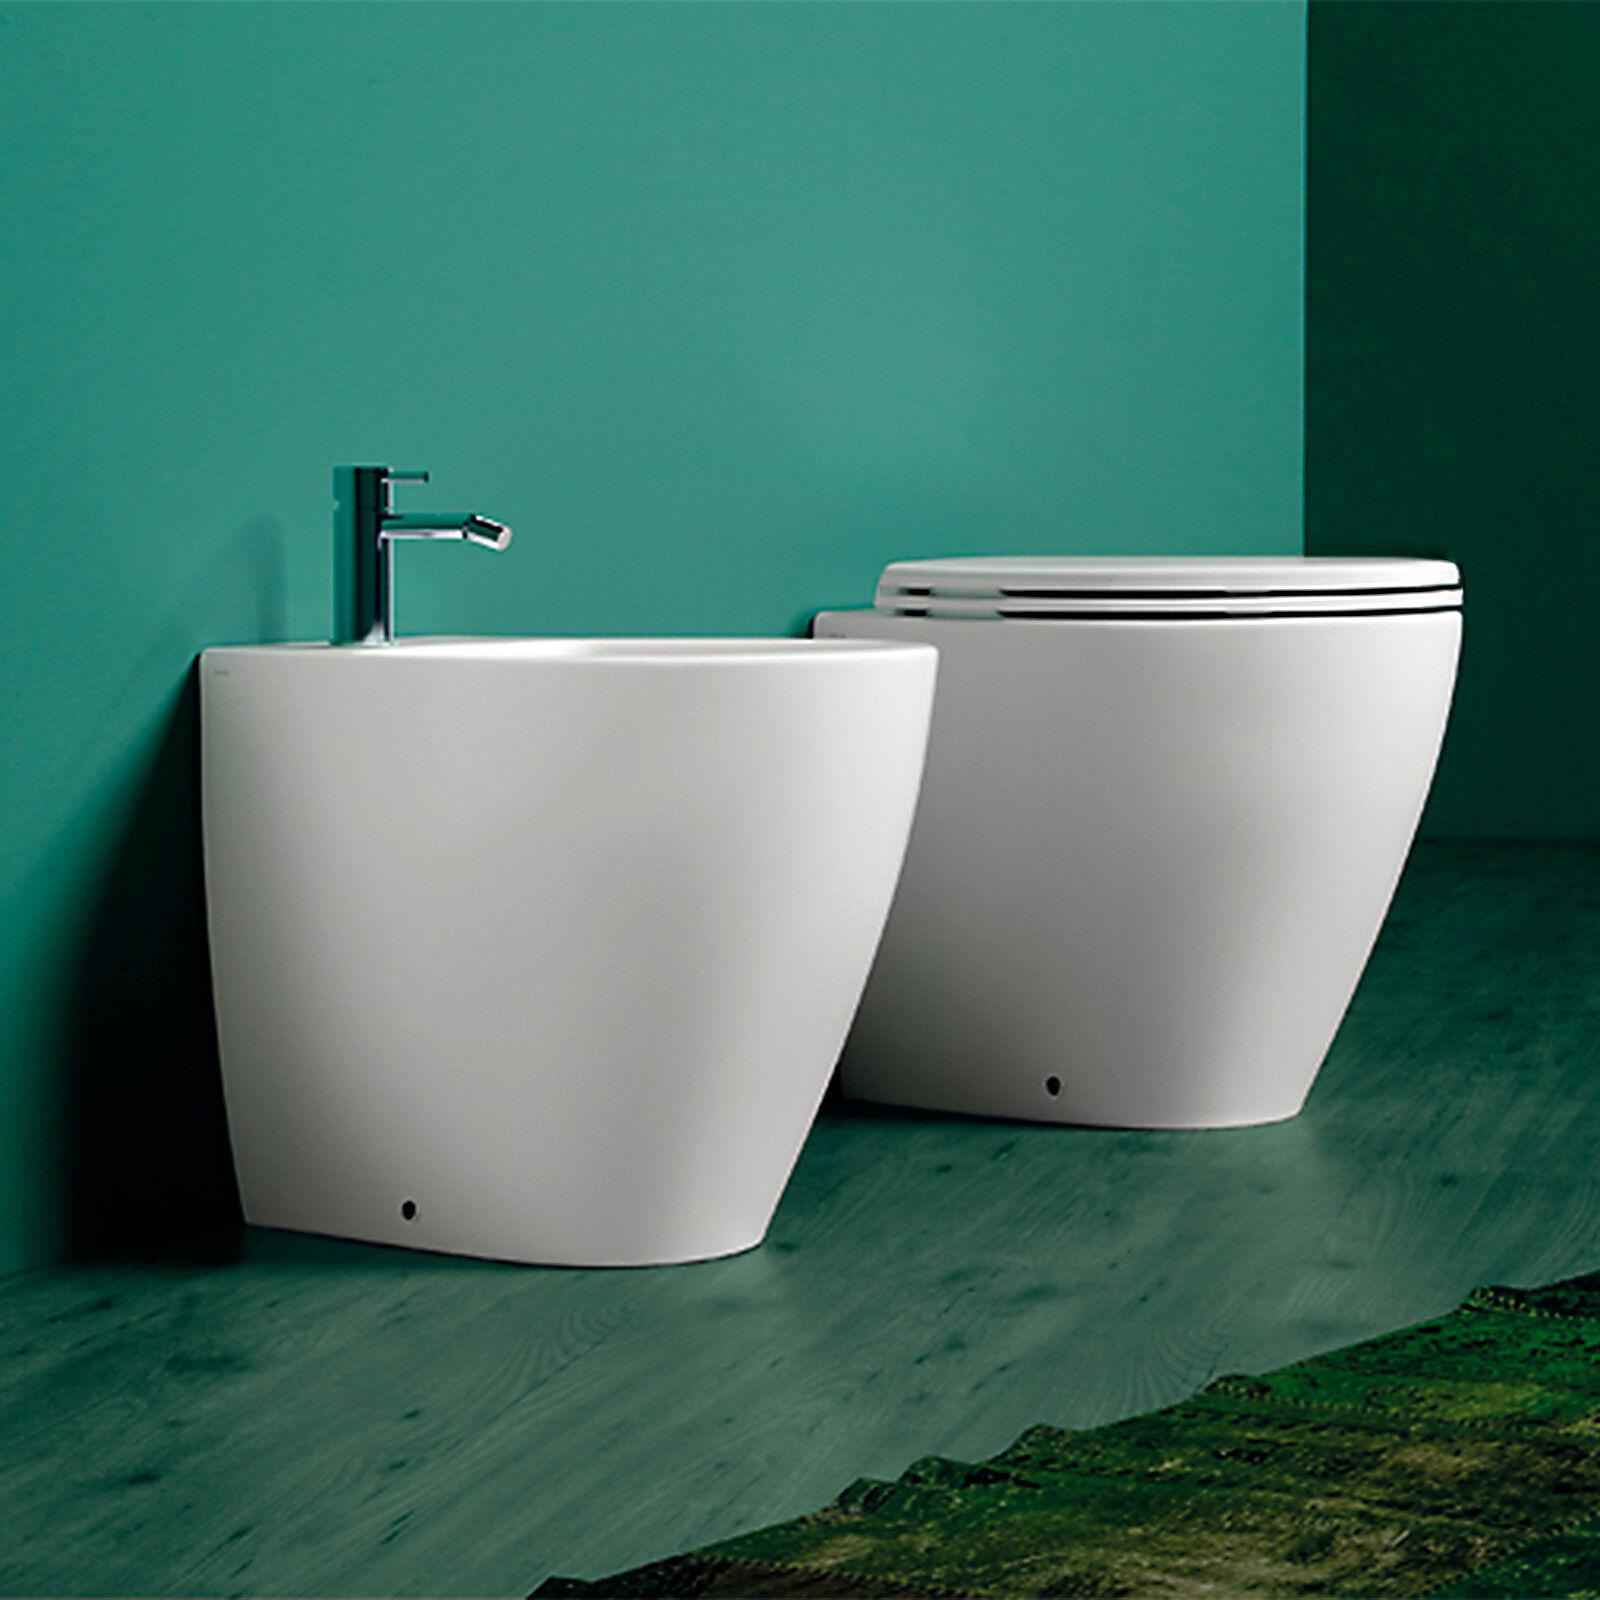 Sanitari filomuro ceramica wc con sedile avvolgente bagno stile moderno stondato